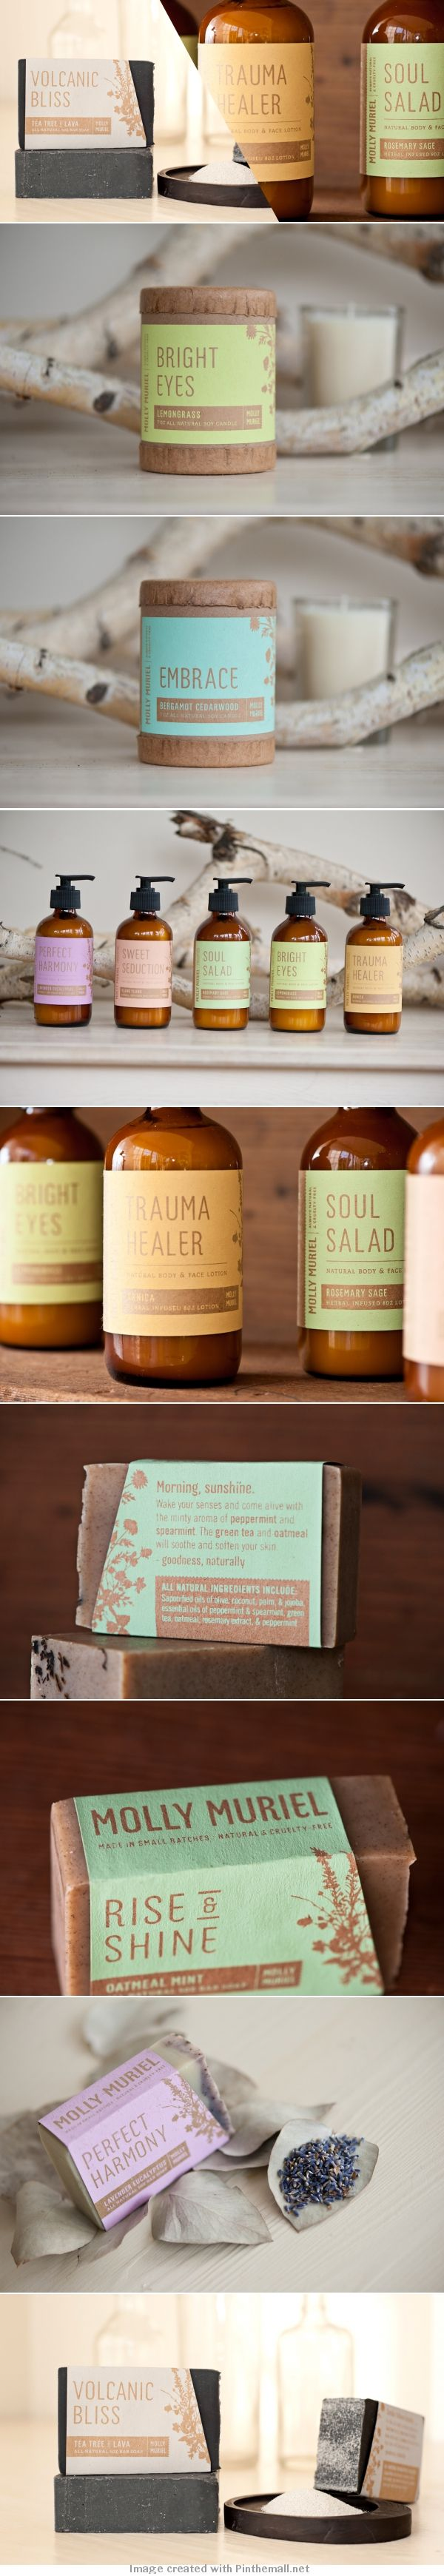 Unique Packaging Design on the Internet, Molly Muriel #packagingdesign #packaging #design http://www.pinterest.com/aldenchong/design/